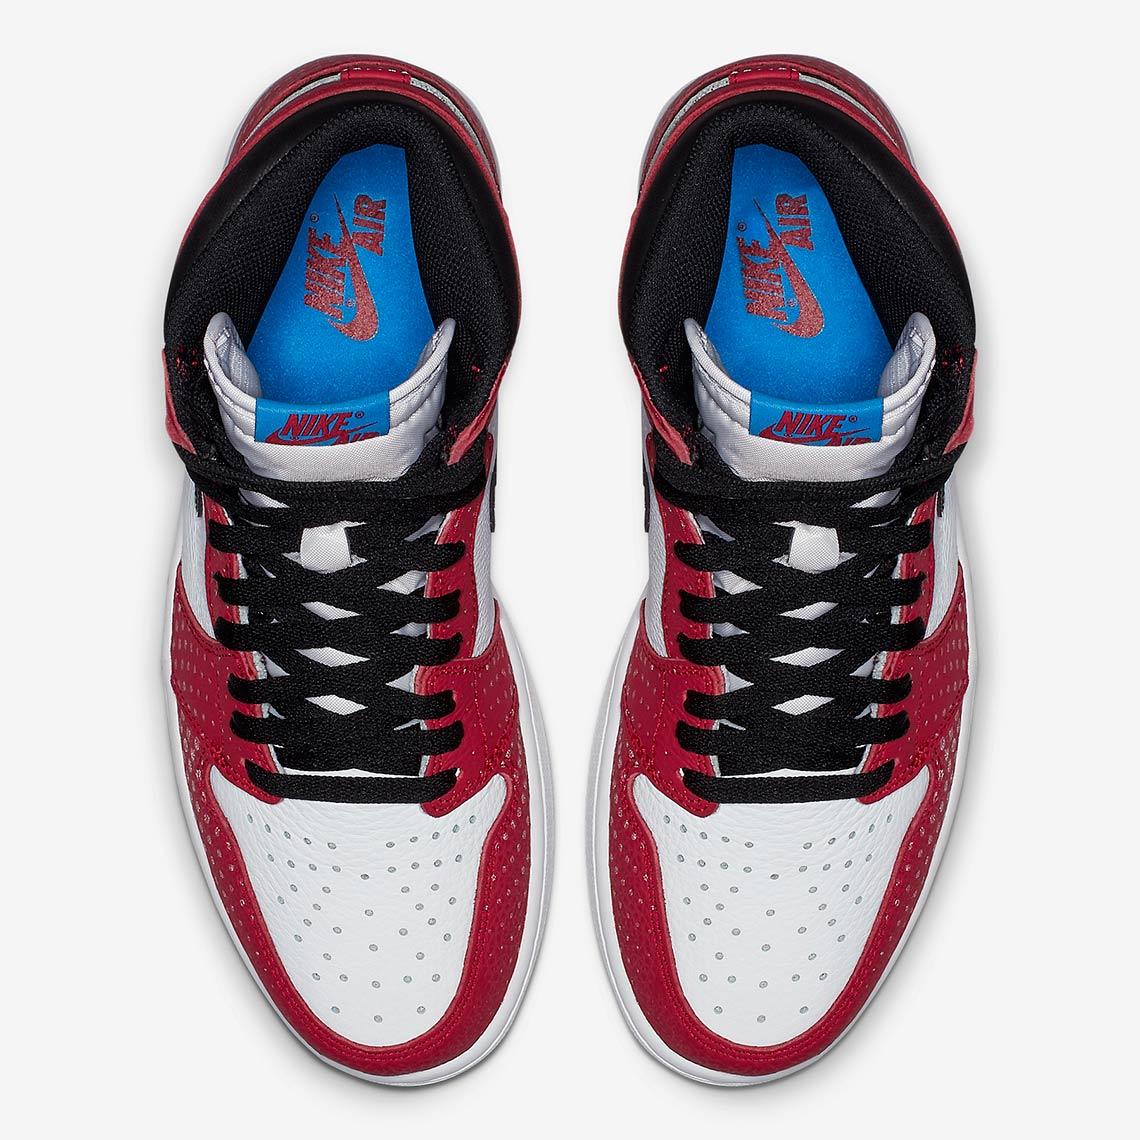 0e624e4907e4bb Jordan 1 Spider-Man 575441-602 Release Date + Info